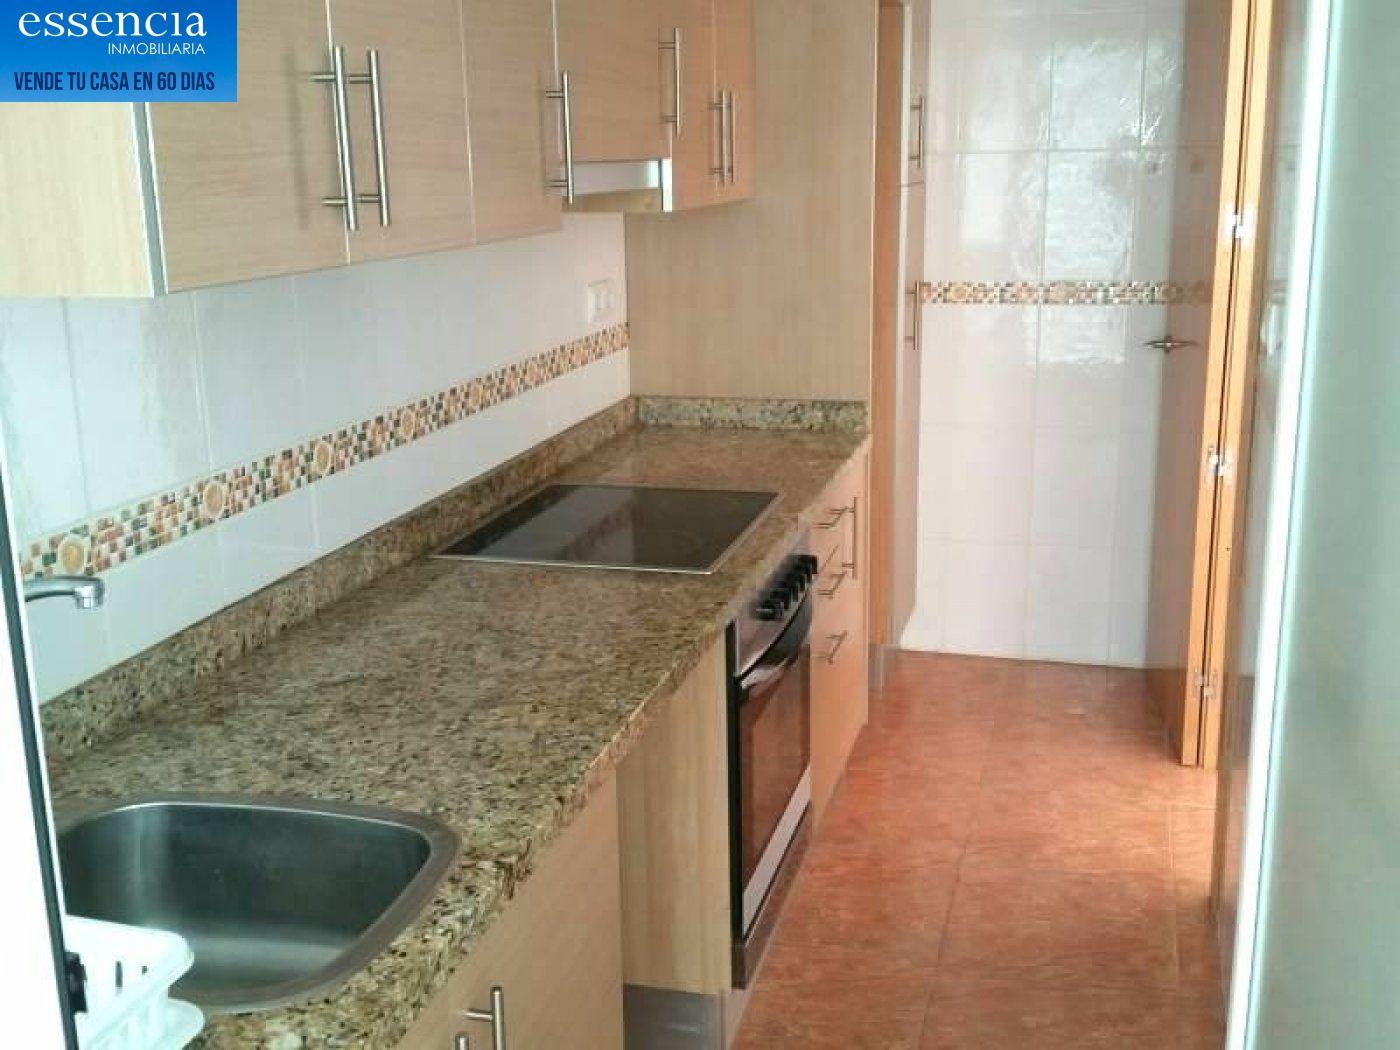 Oferta sin visitar. piso en oliva con ascensor, calle isaac albeniz - imagenInmueble13